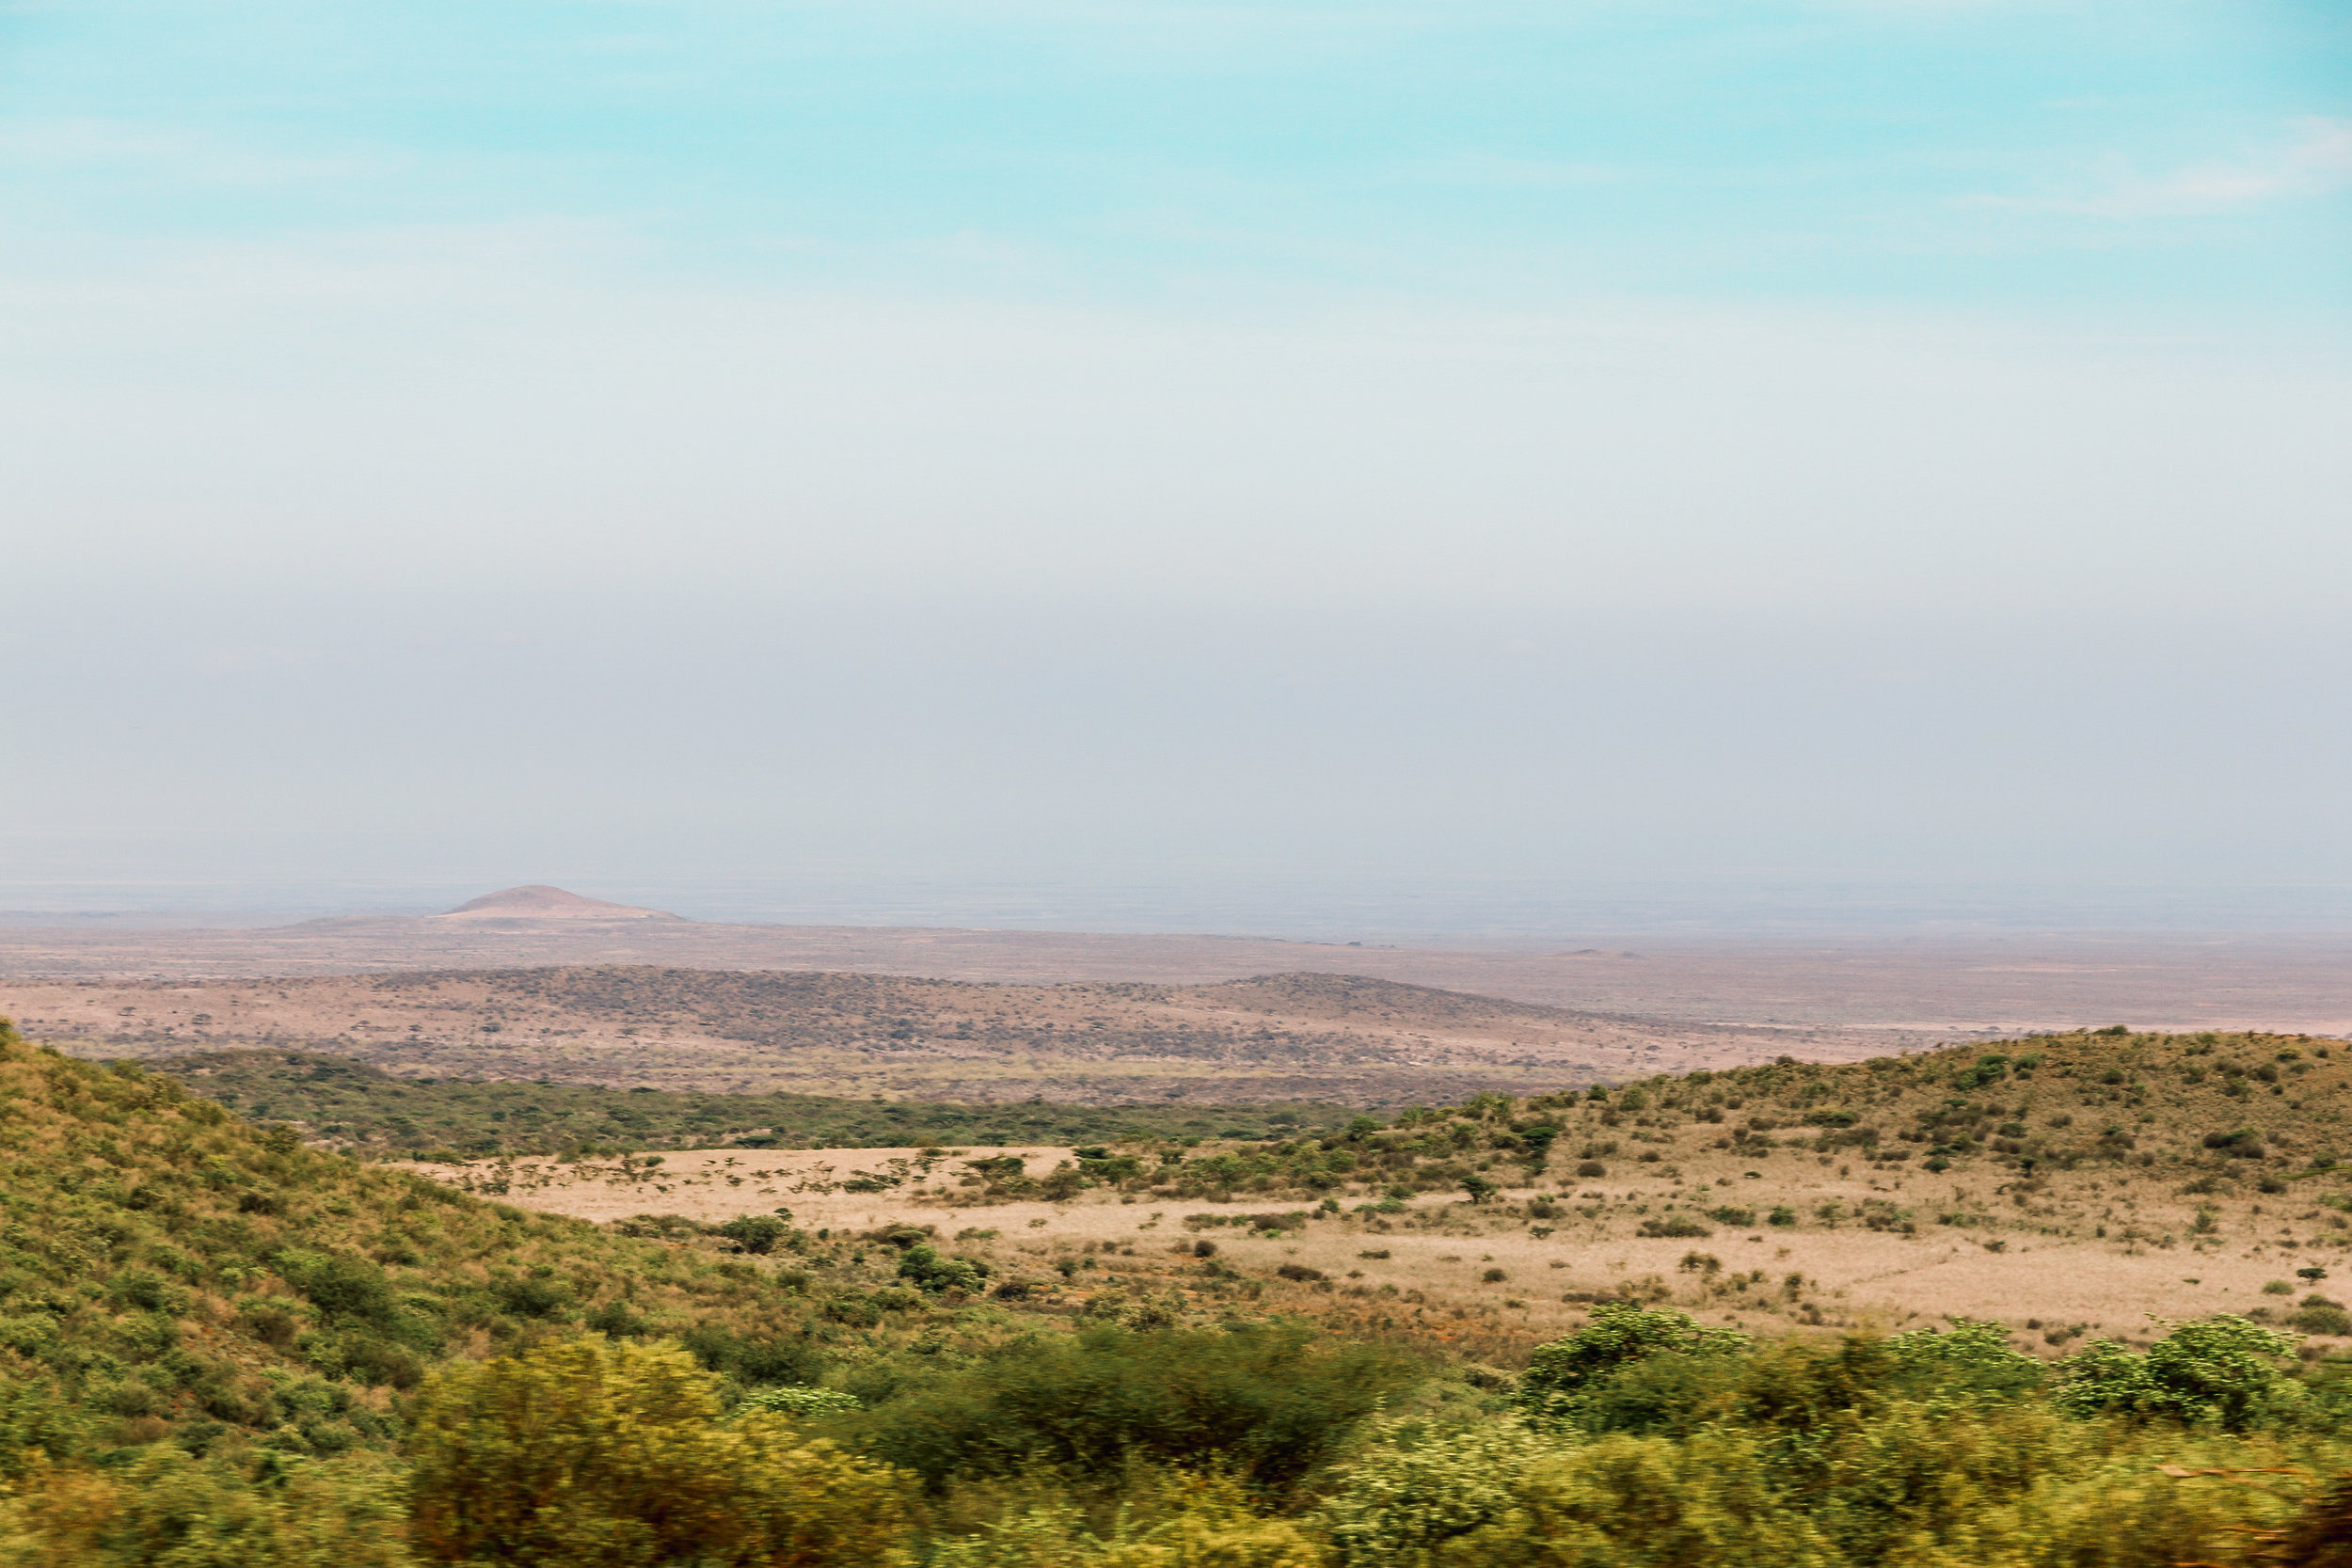 Africa2017-81.jpg